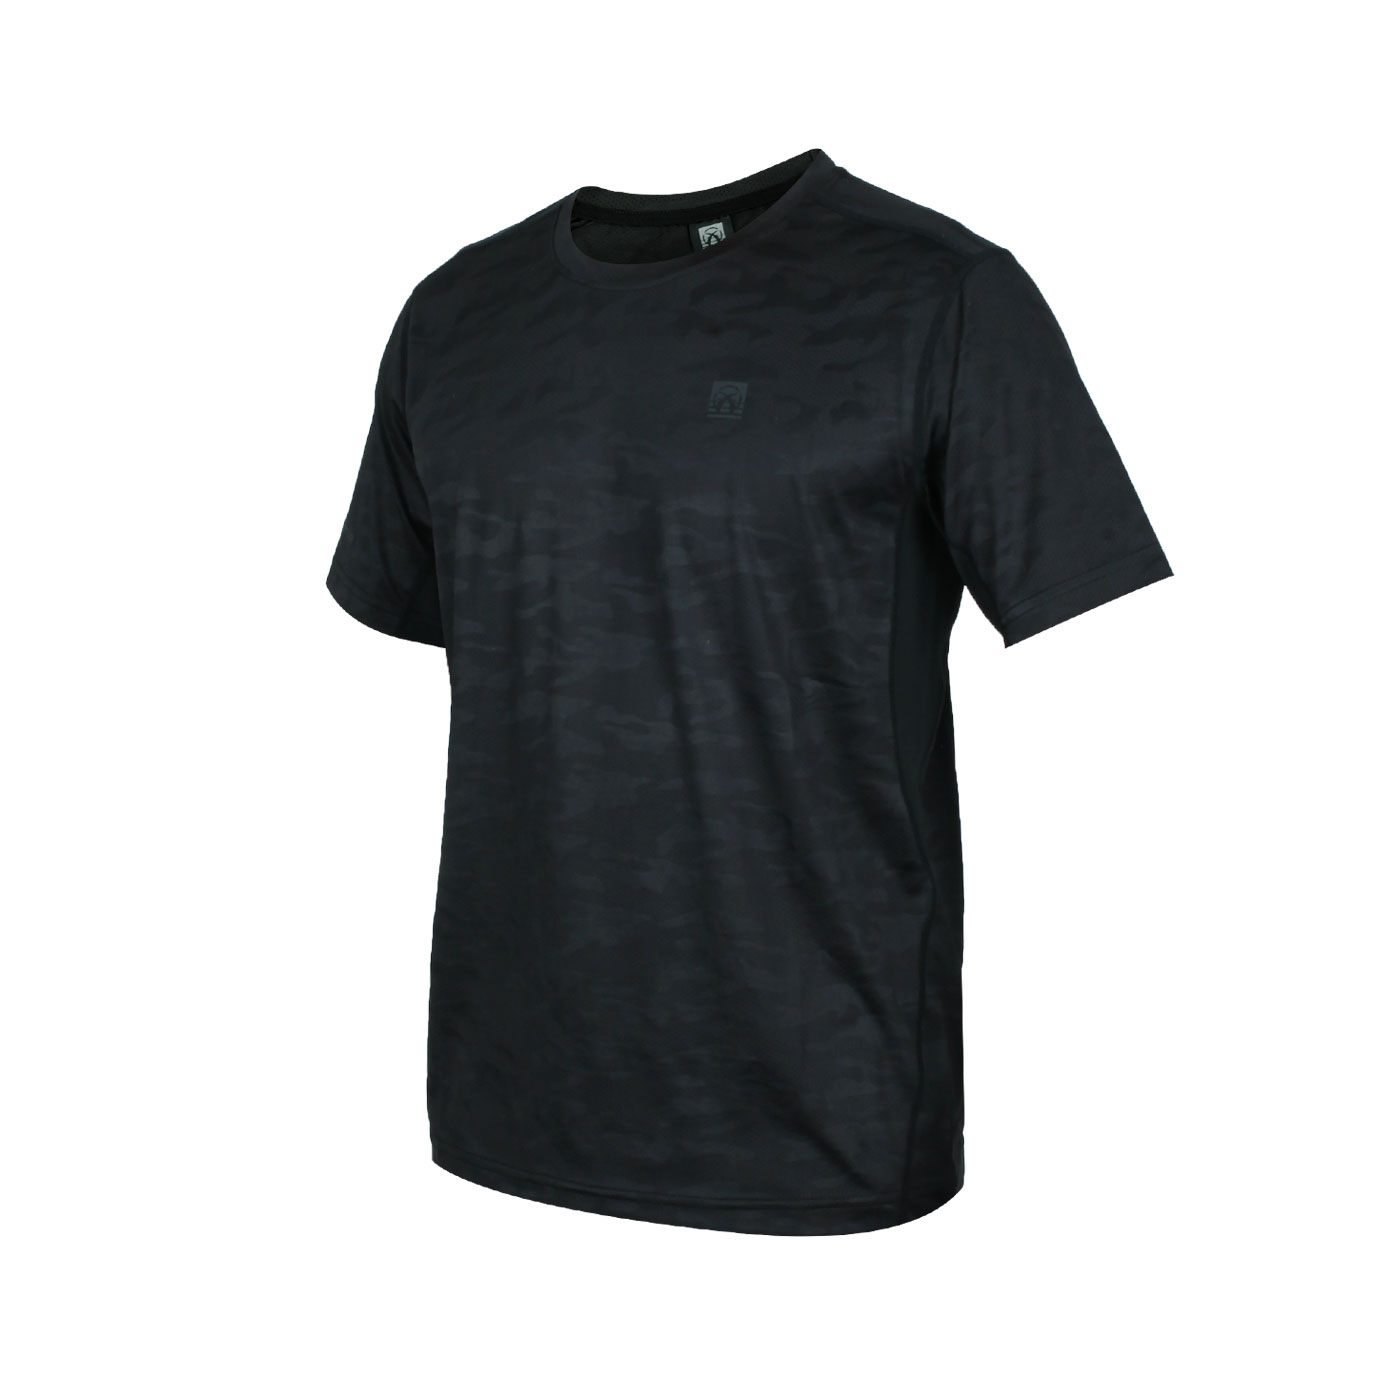 FIRESTAR 男款彈性圓領短袖T恤 D0532-10 - 黑